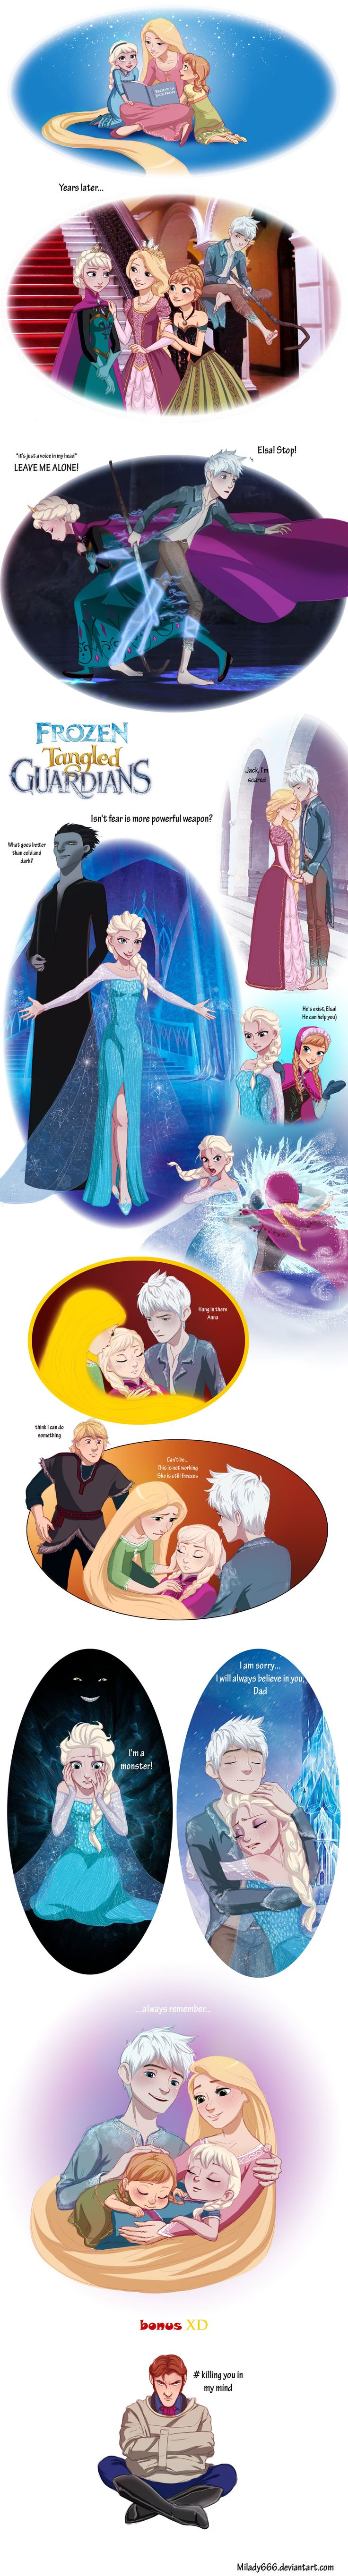 Frozen Tangled Guardians_alternative story by Milady666.deviantart.com on @deviantART